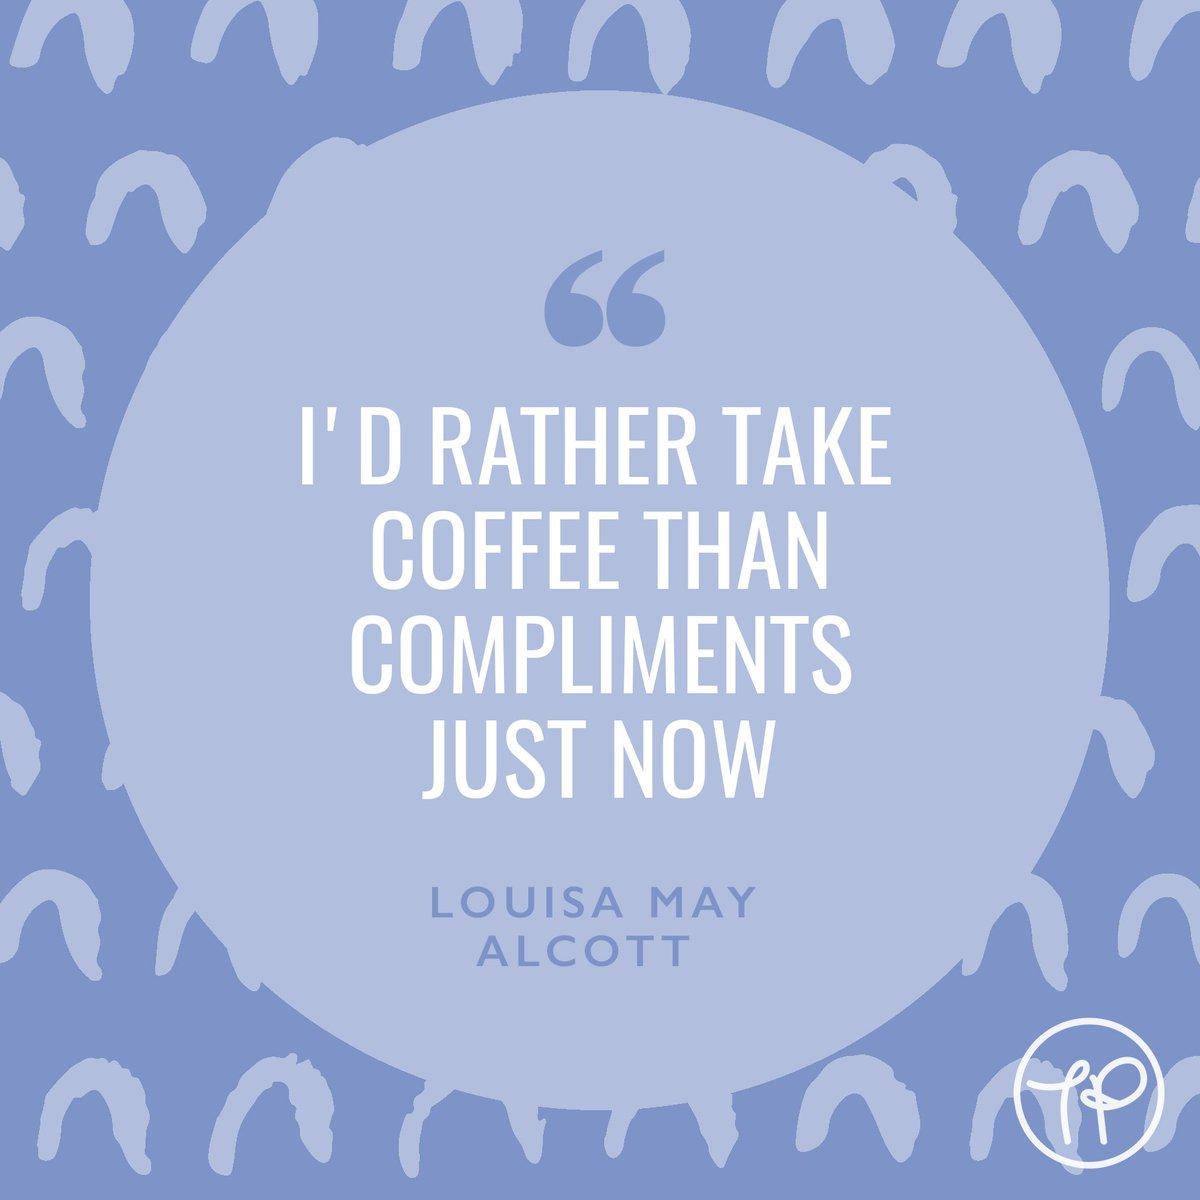 Louisa May Alcott Poems 3